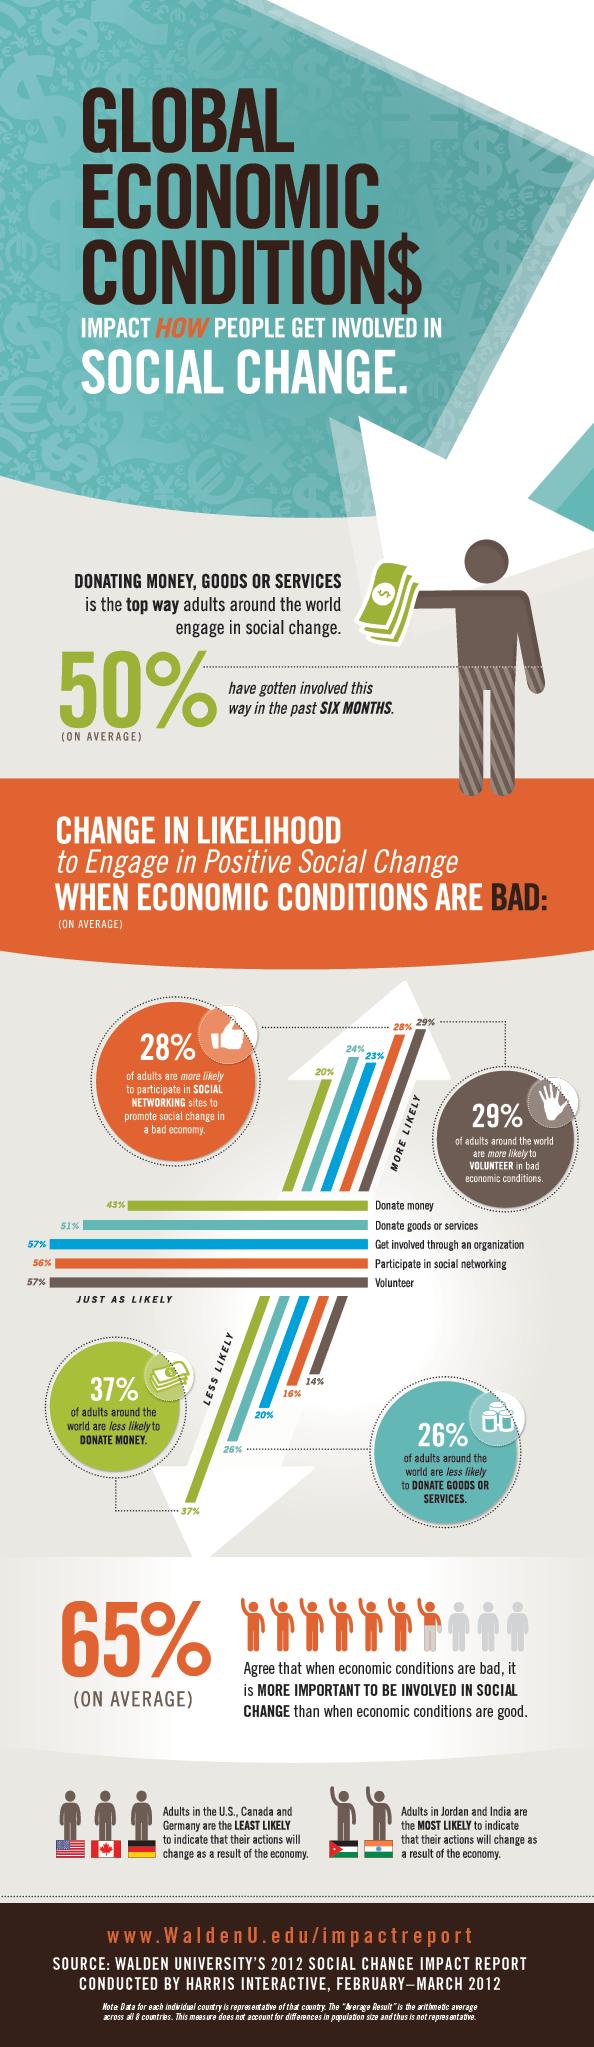 Globaleconomicconditionsimpactsocialchange_4ffc73ece0f58